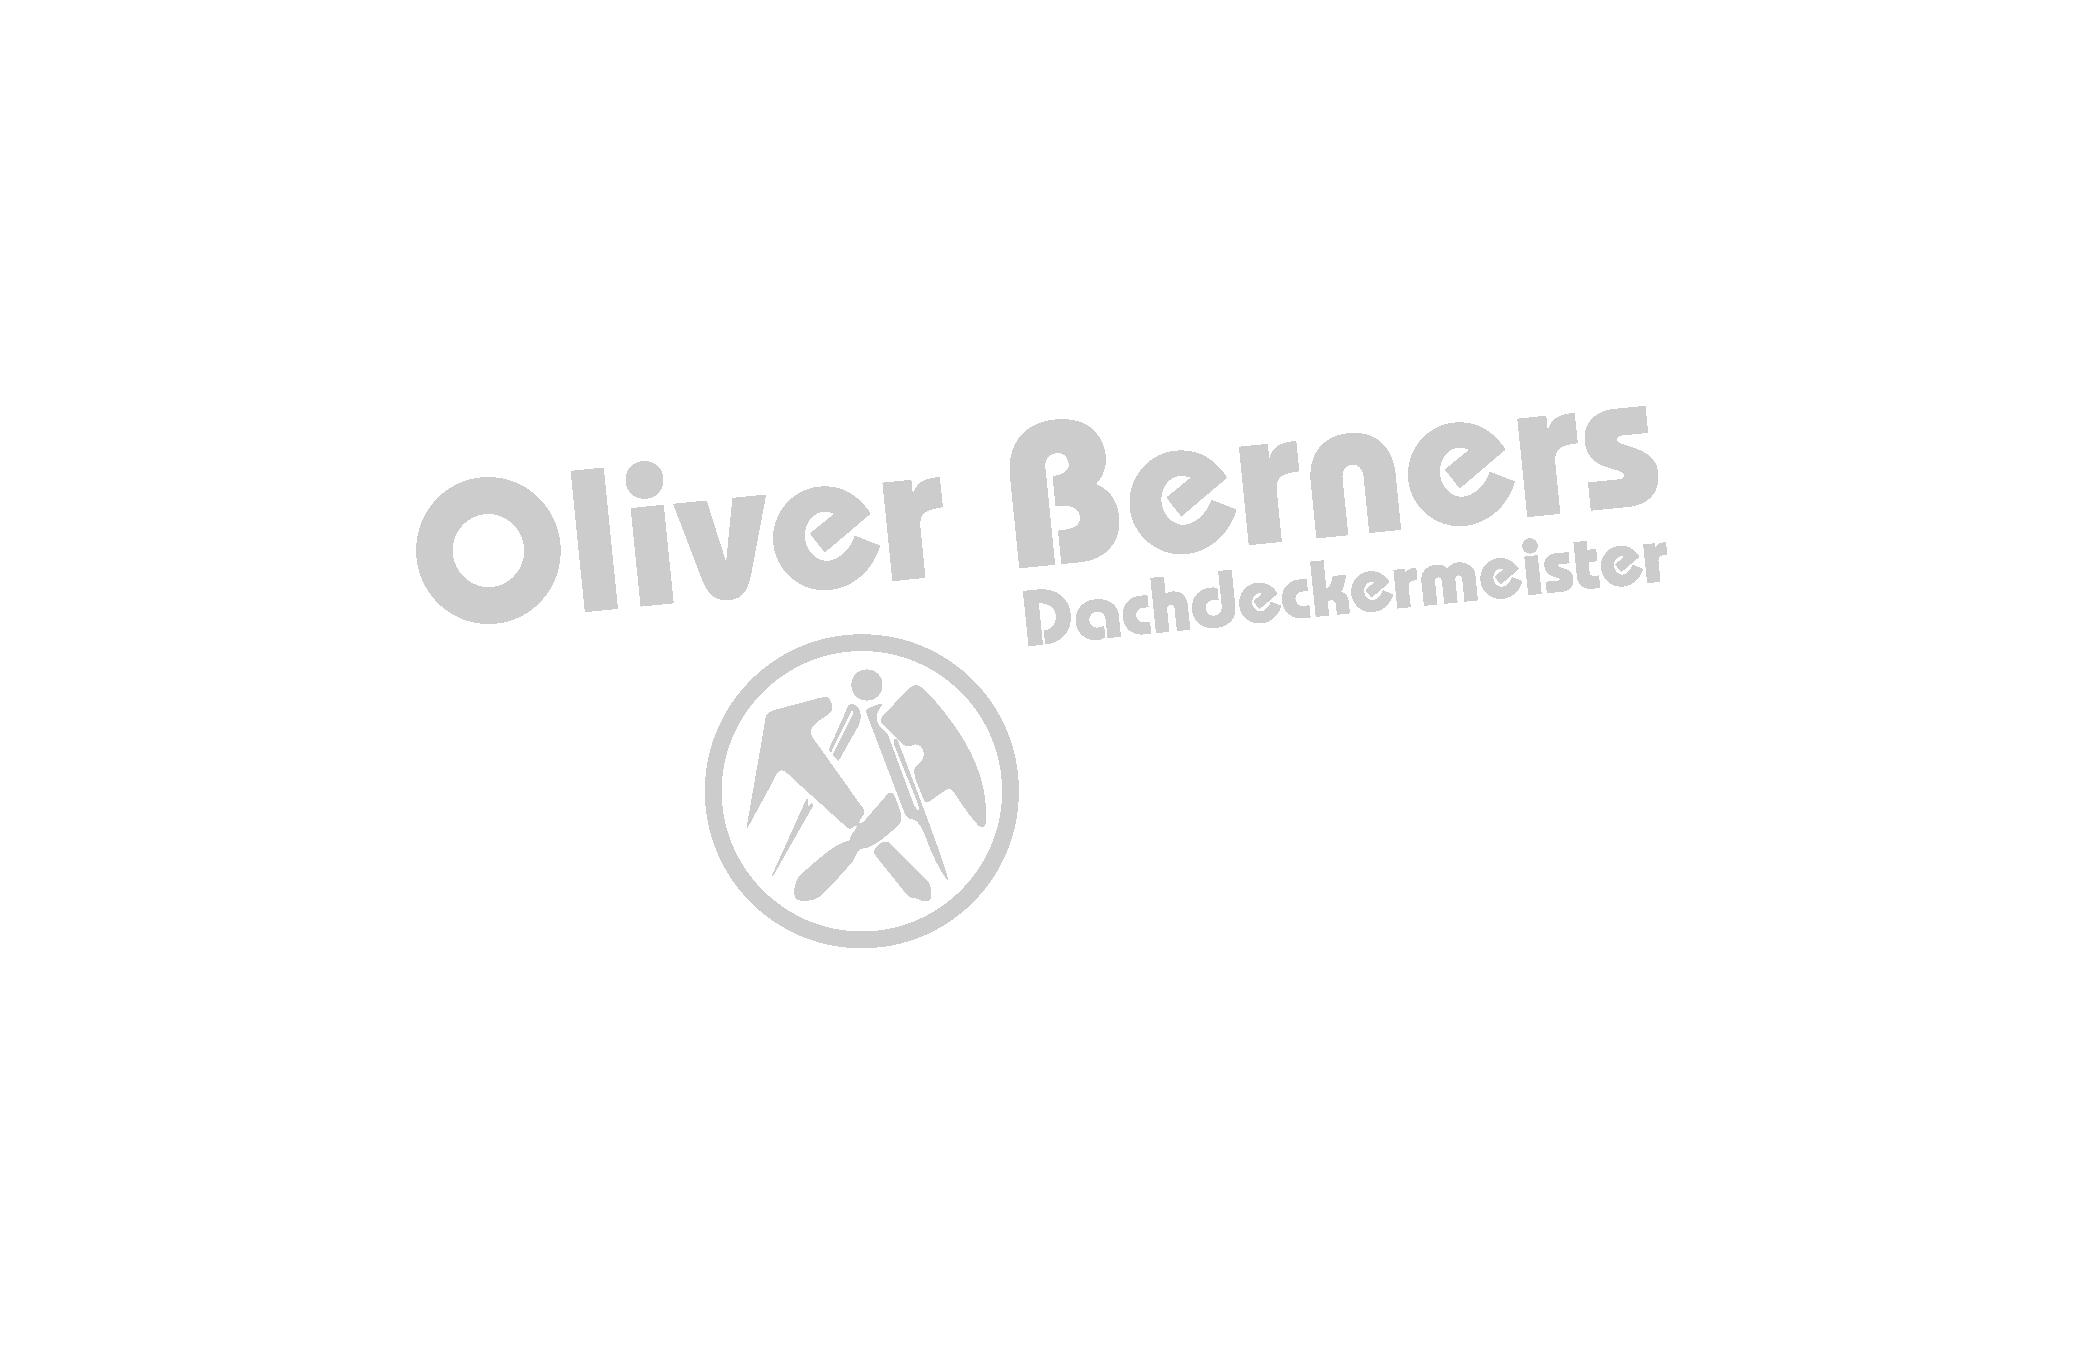 Dachdeckermeister Oliver Berners